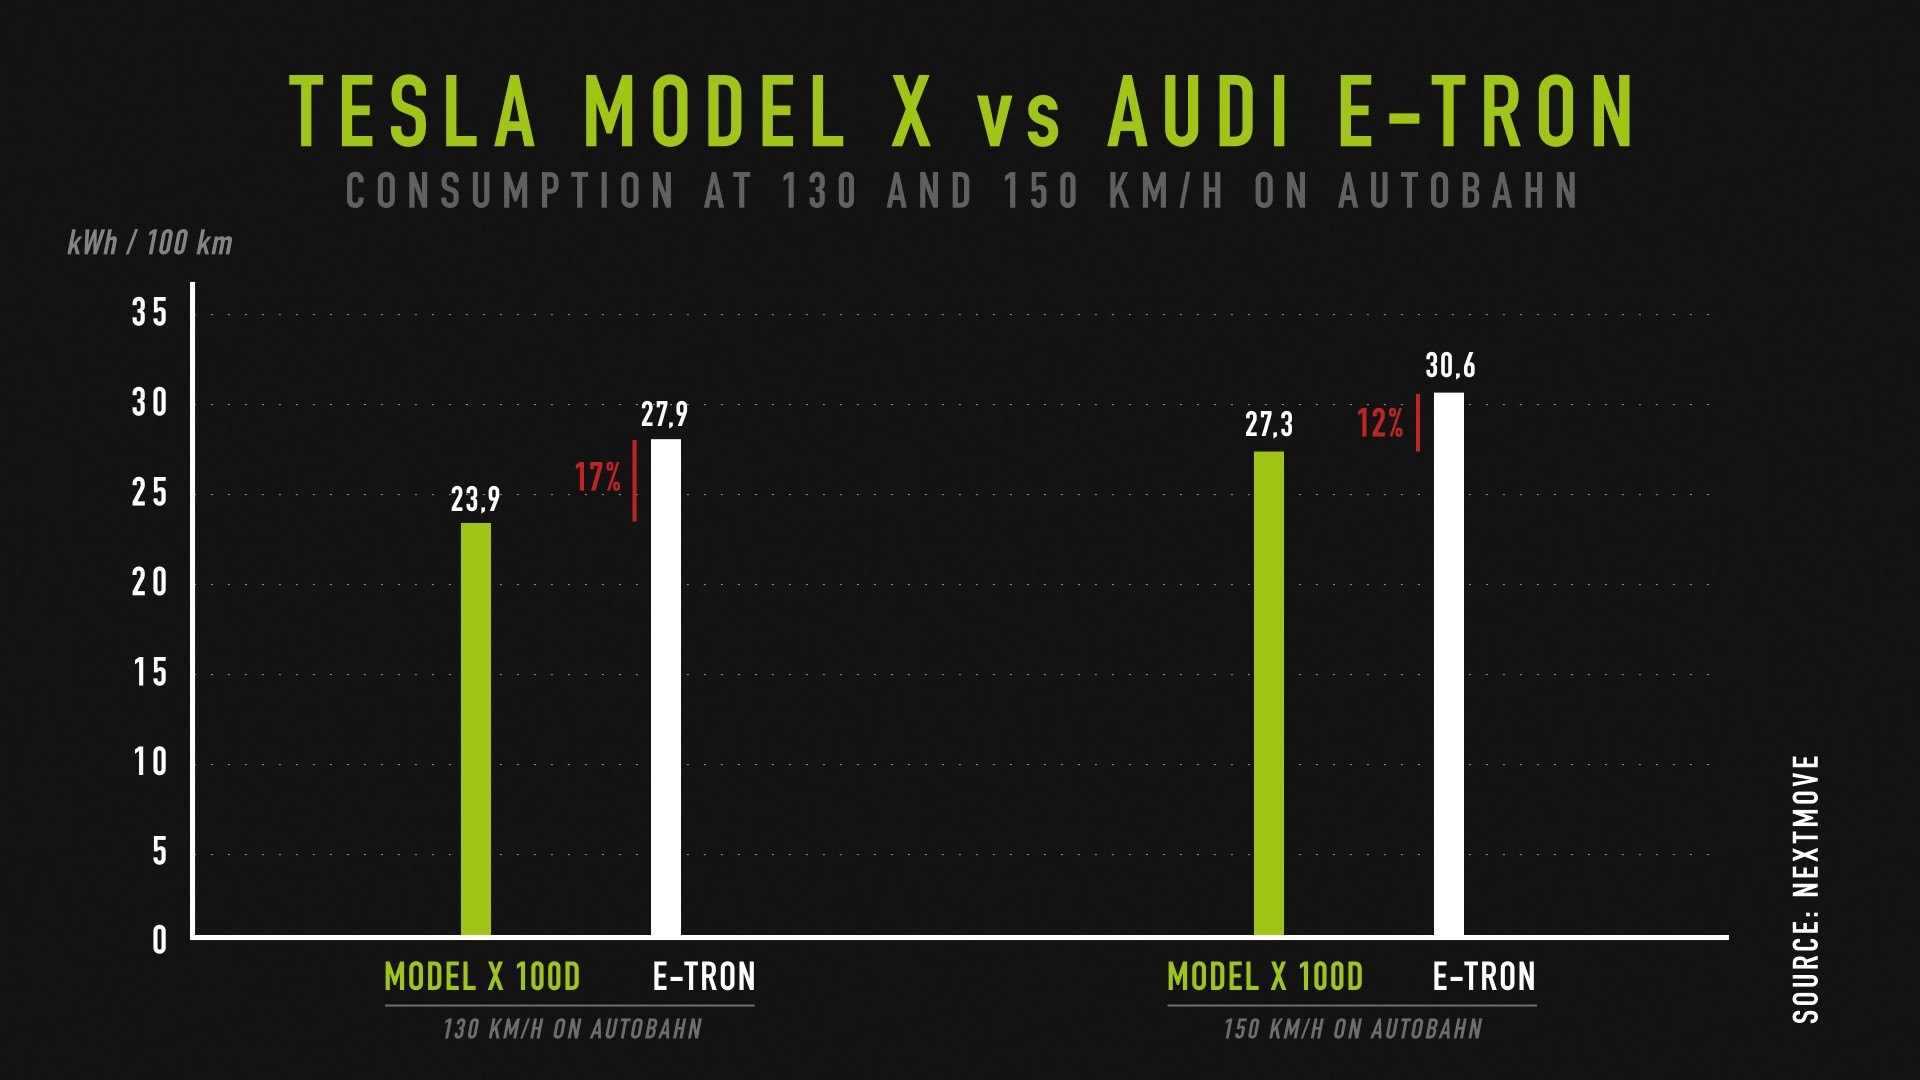 nextmove-Autobahn-test-Model-X-vs-Audi-etron-at-130-vs-150-kph